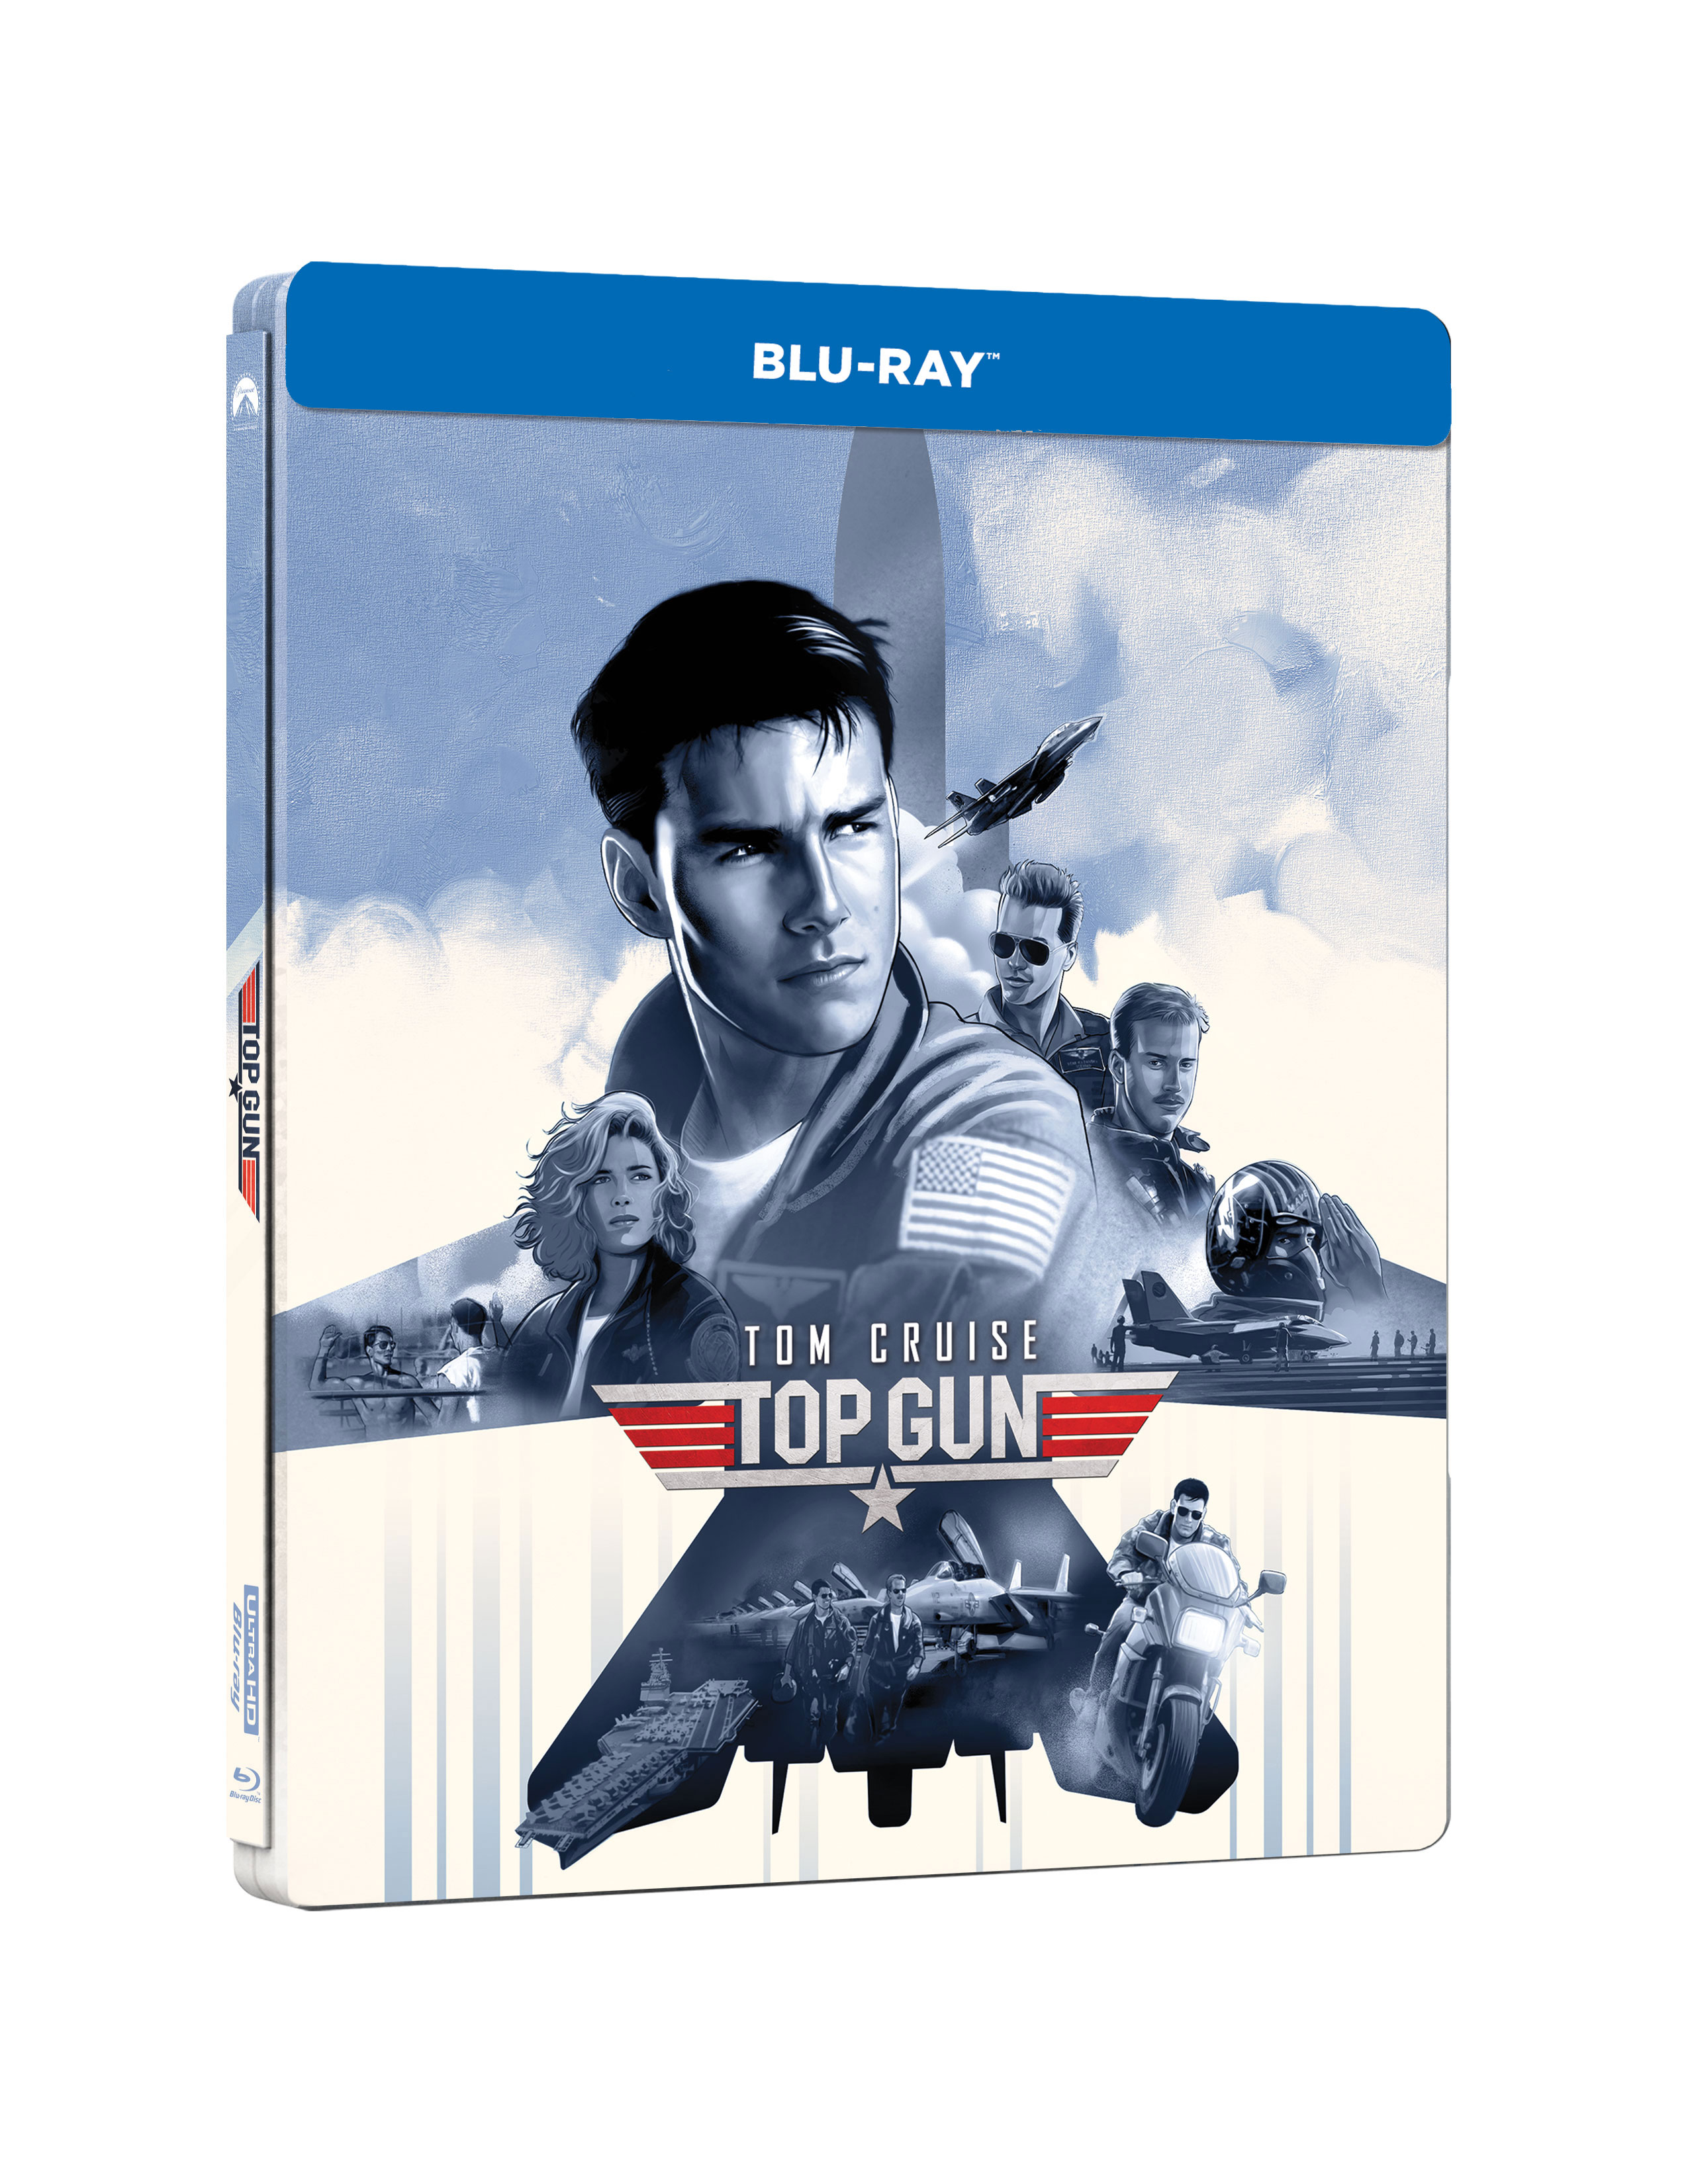 Top Gun - Blu-ray - Steelbook